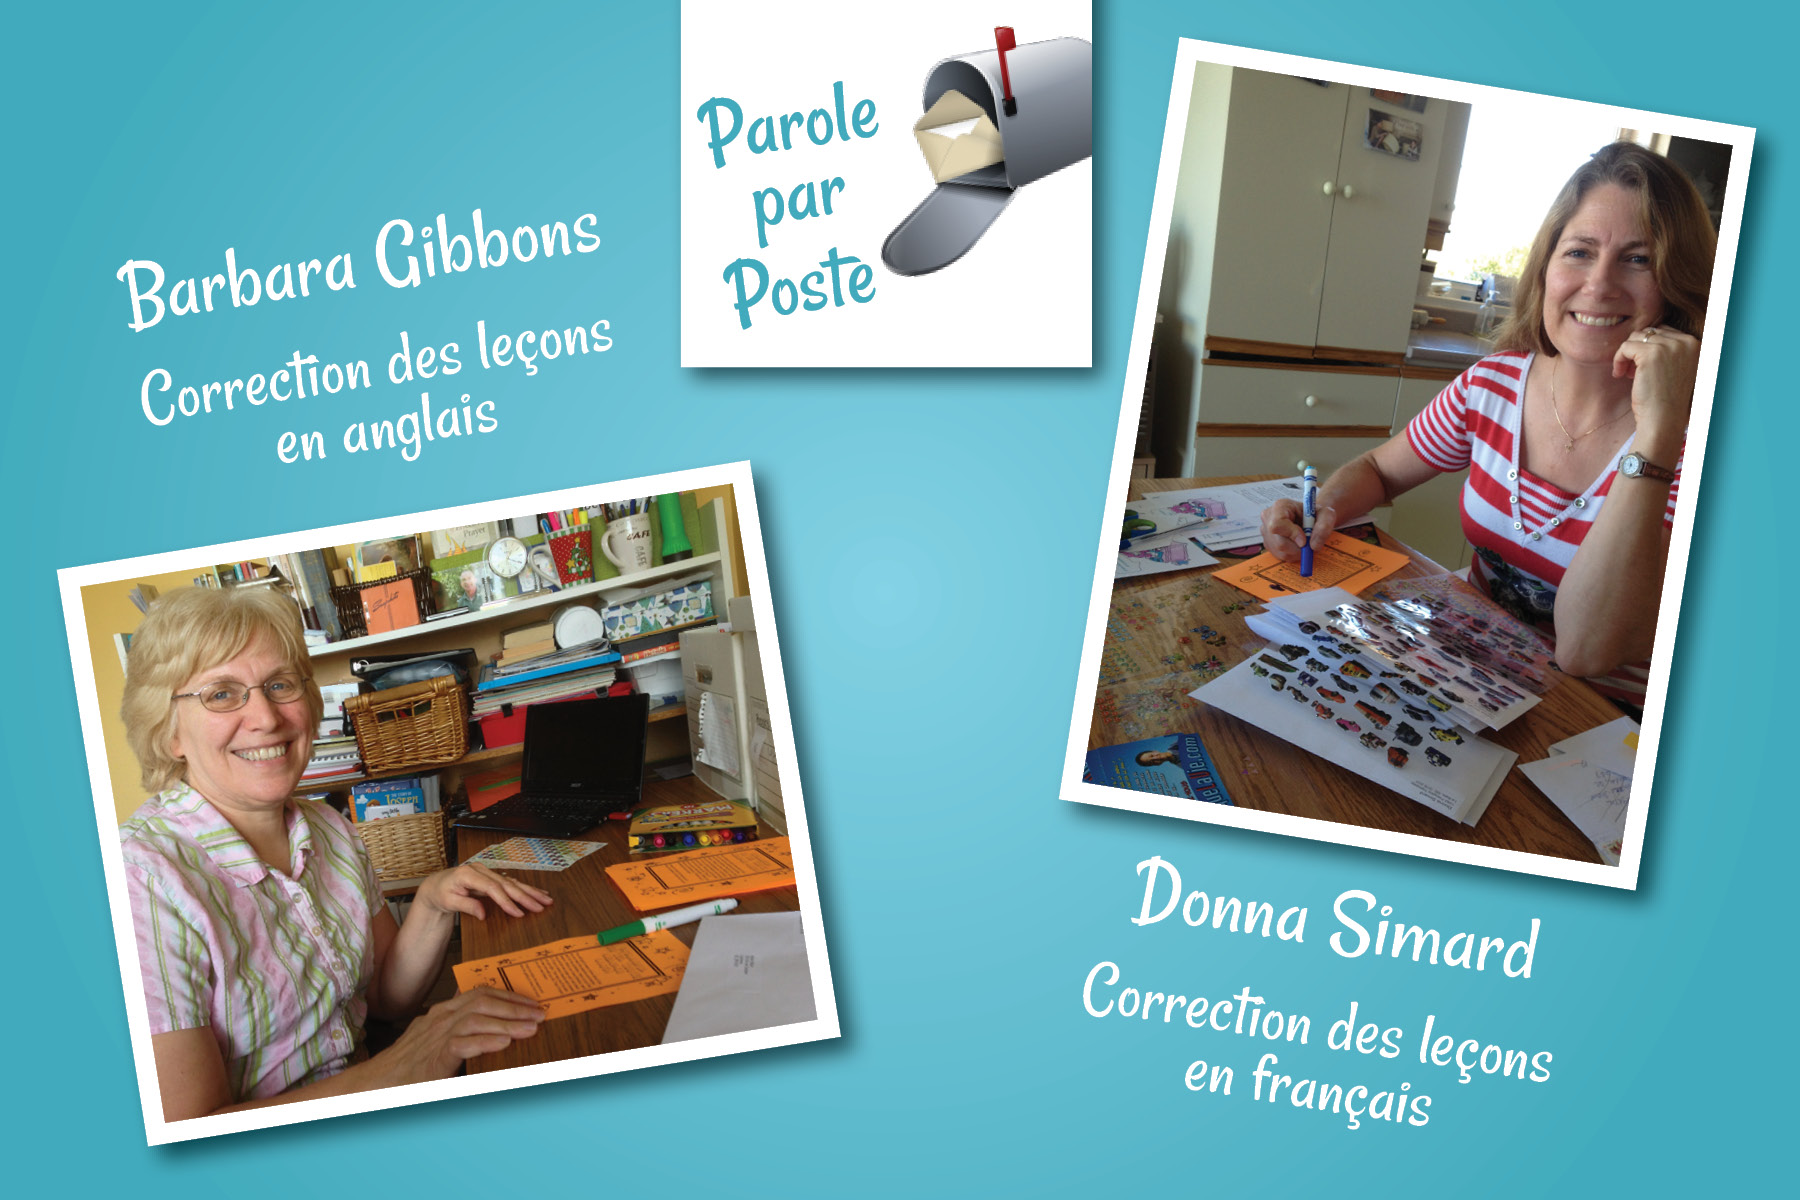 Barbara Gibbons and Donna Simard